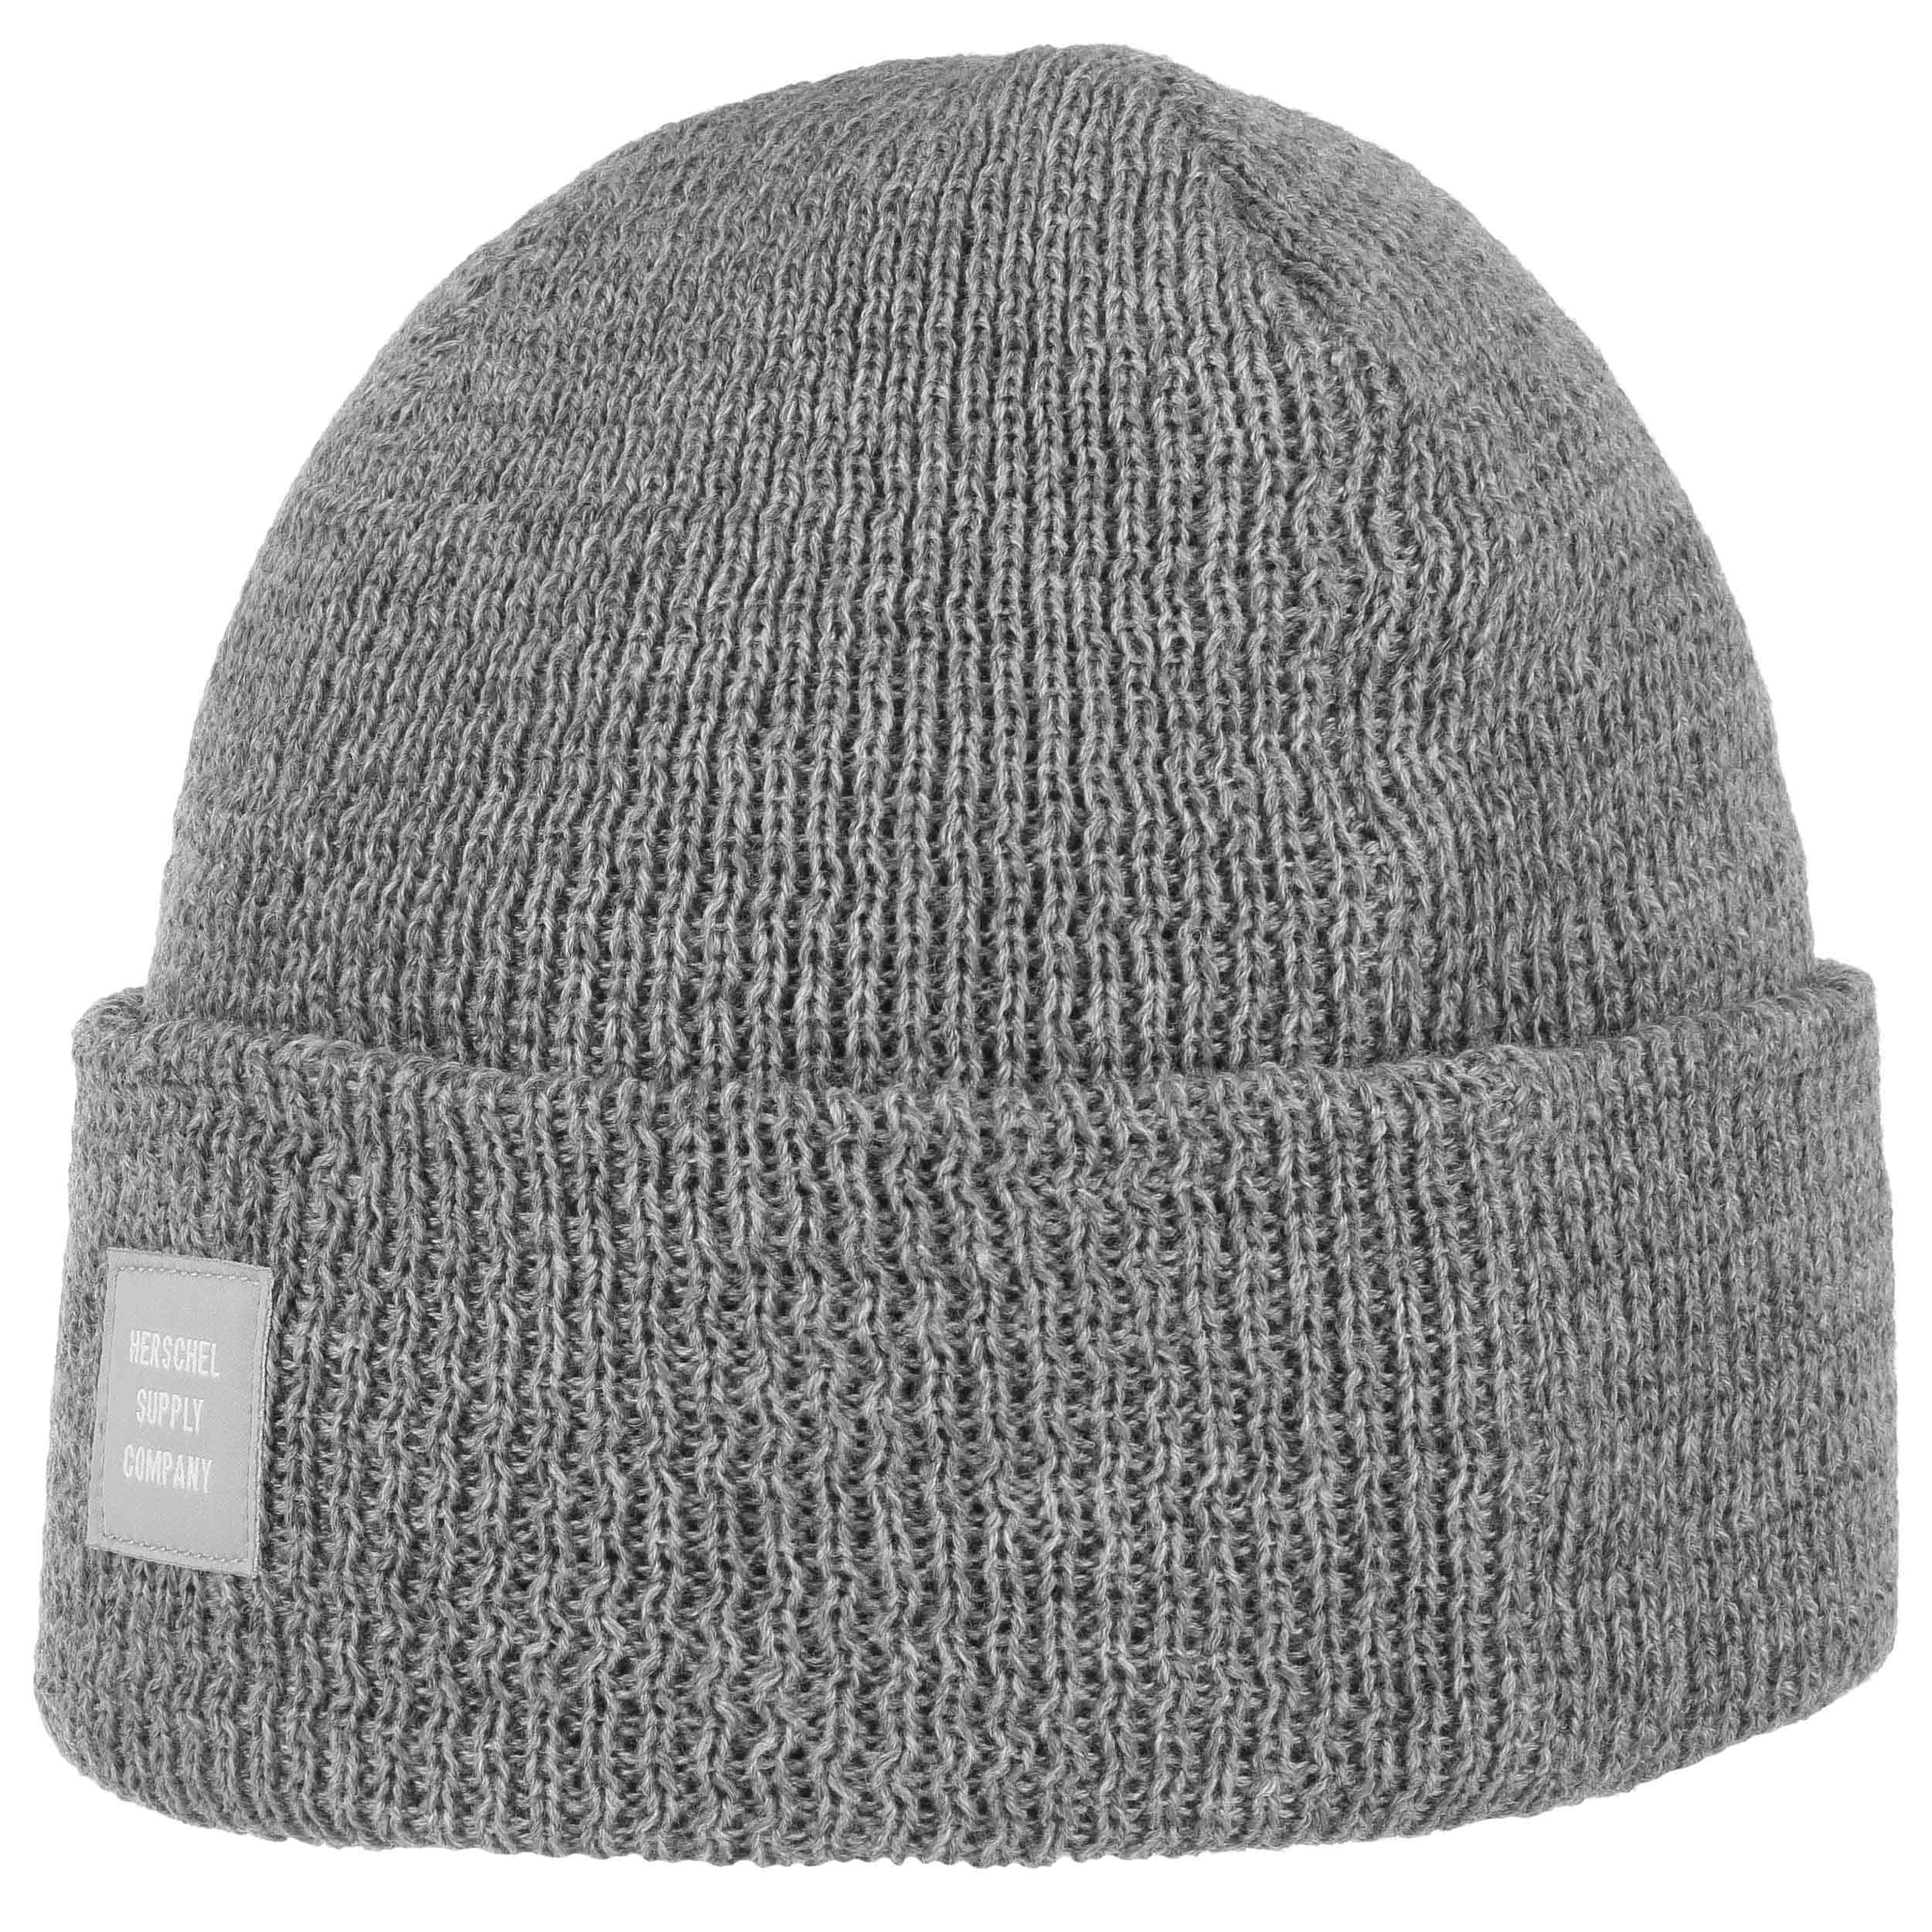 abb4704e2dc ... top quality new arrivals abbot reflective knit hat by herschel 2 80ca0  1563d 467ea 4f2fe good herschel supply ...